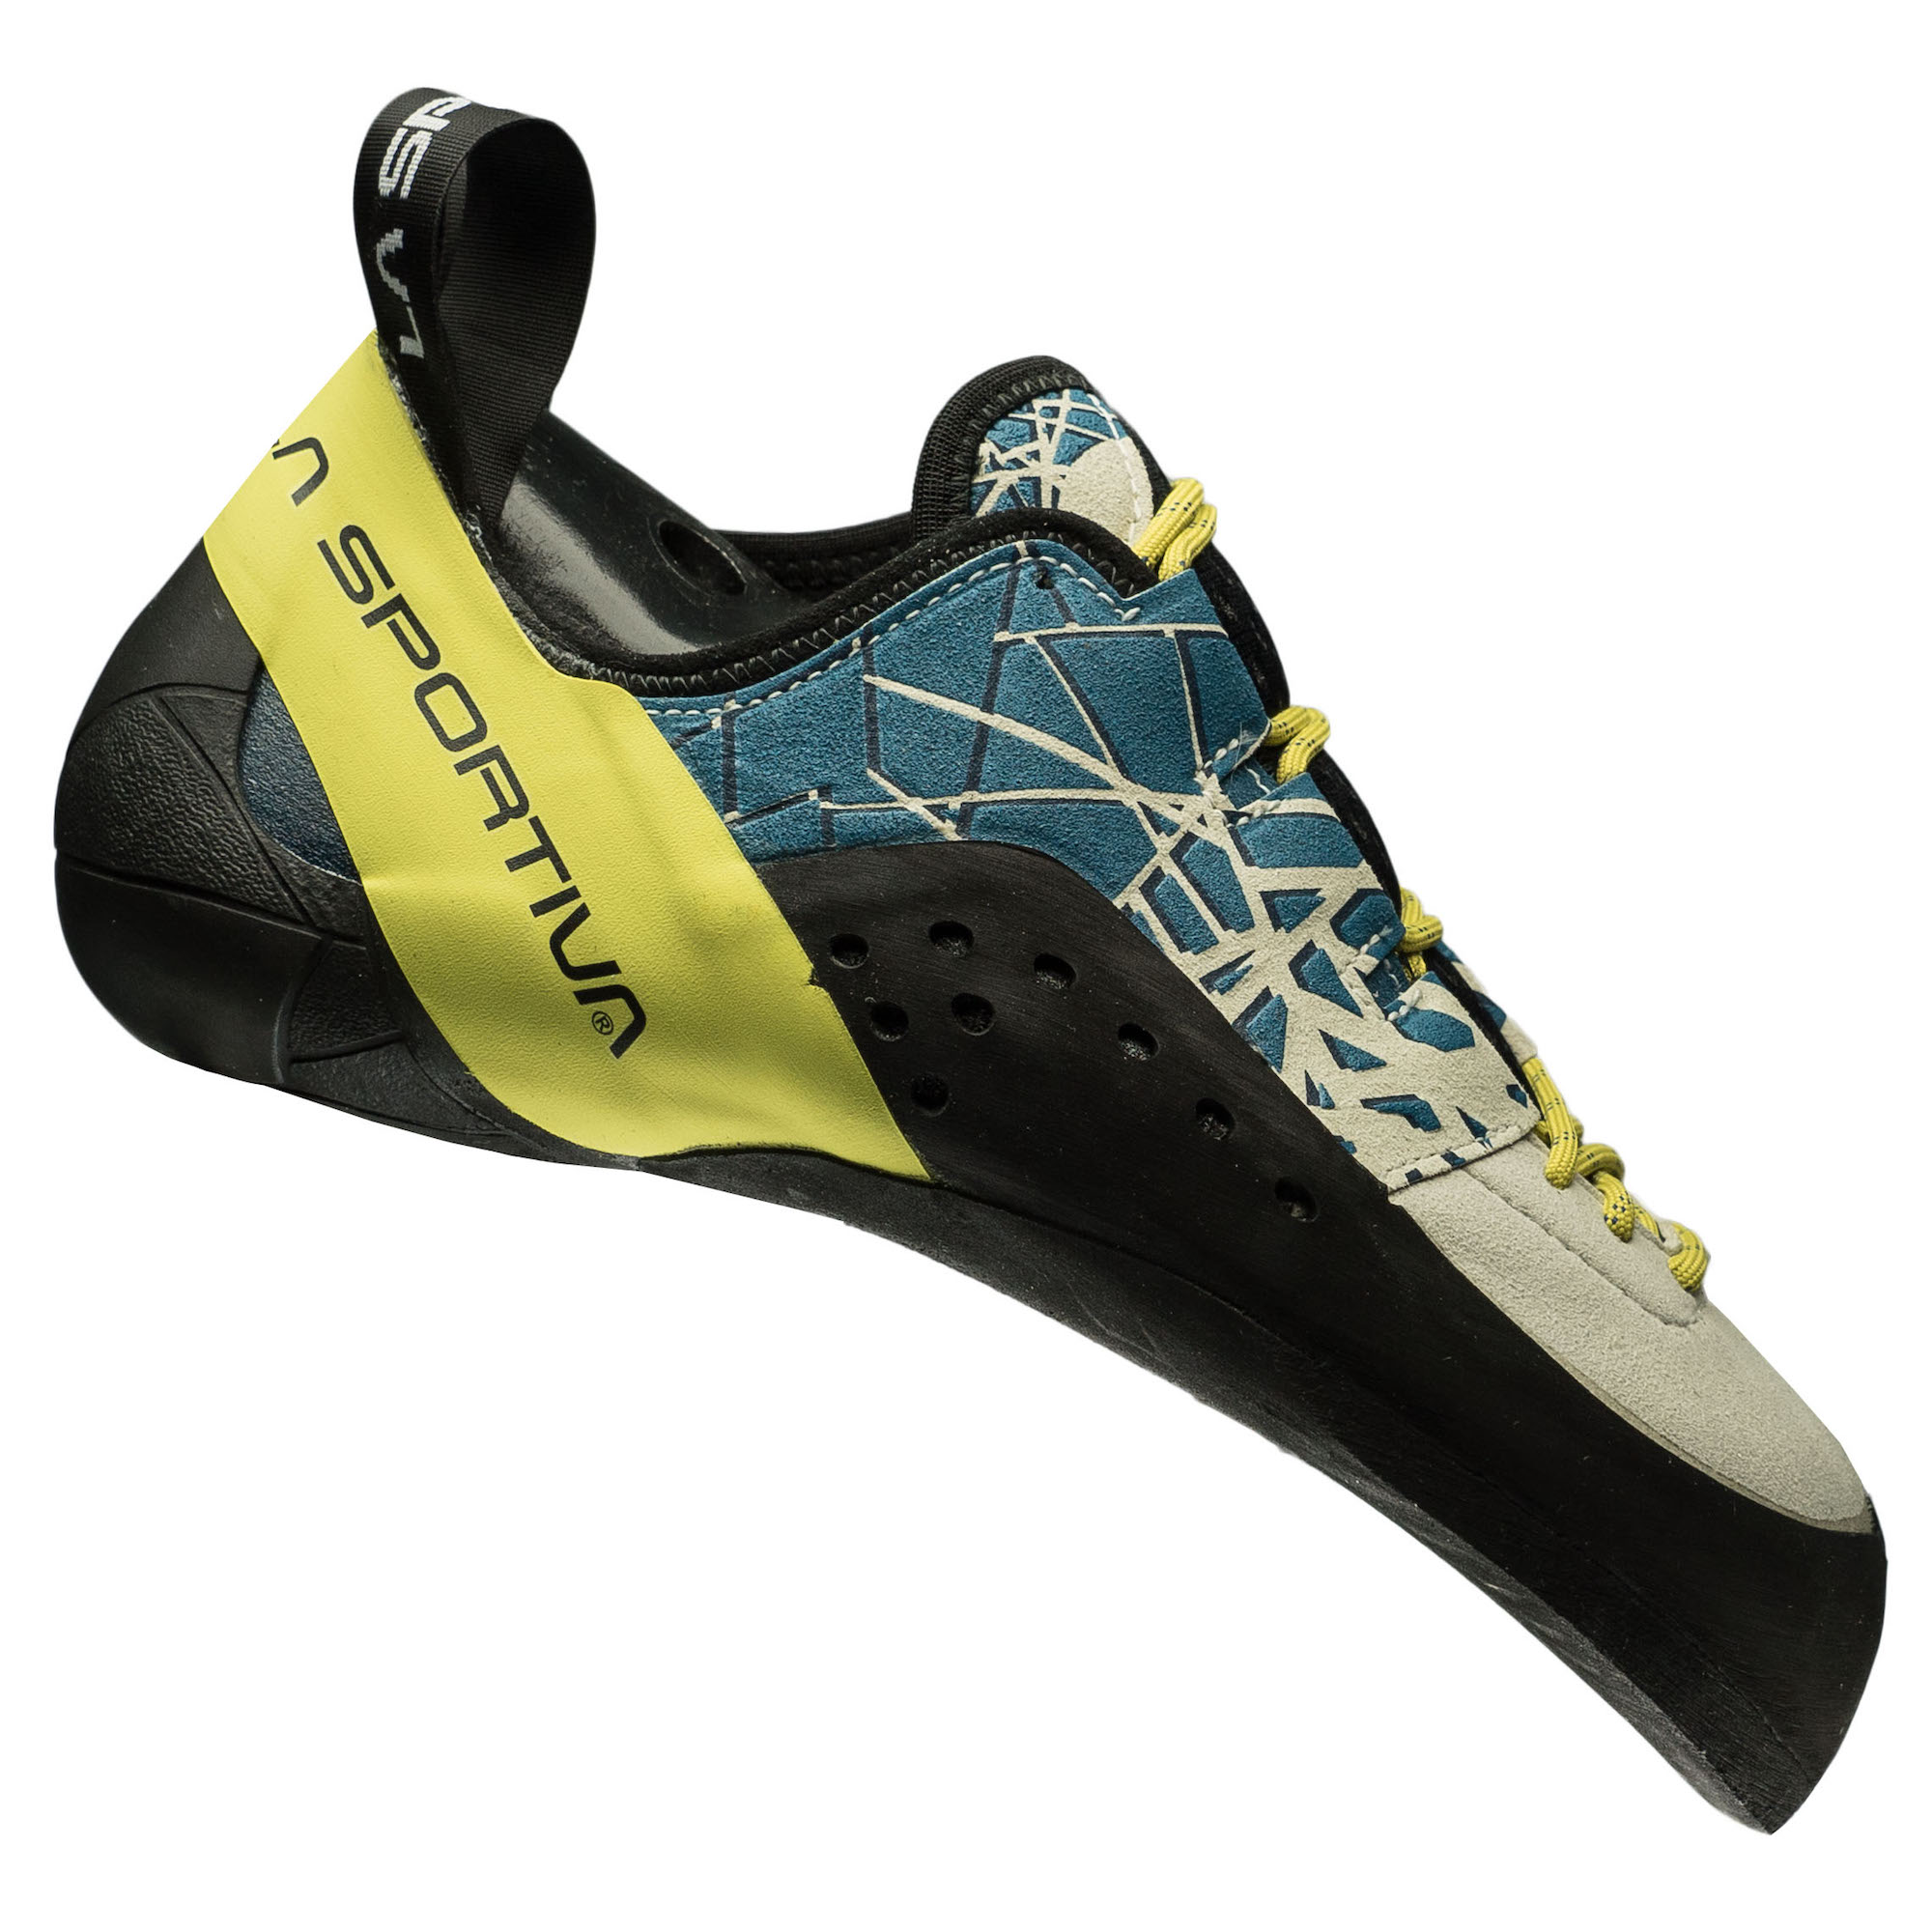 La Sportiva - Kataki - Climbing shoes - Men's